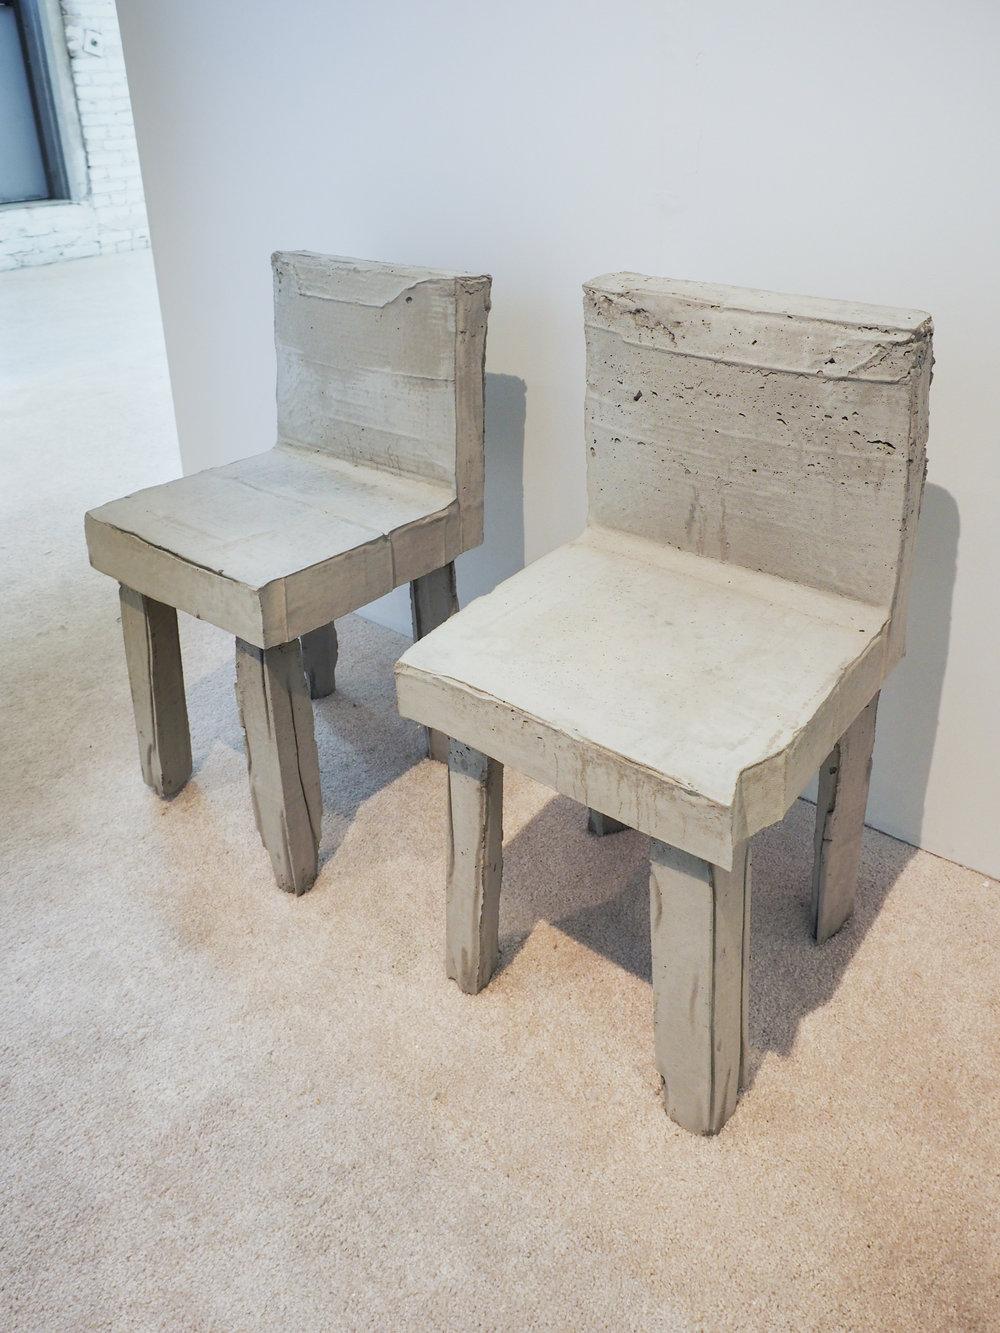 Concrete Chair (1,2)Agata Ingarden concrete, metal reinforcement